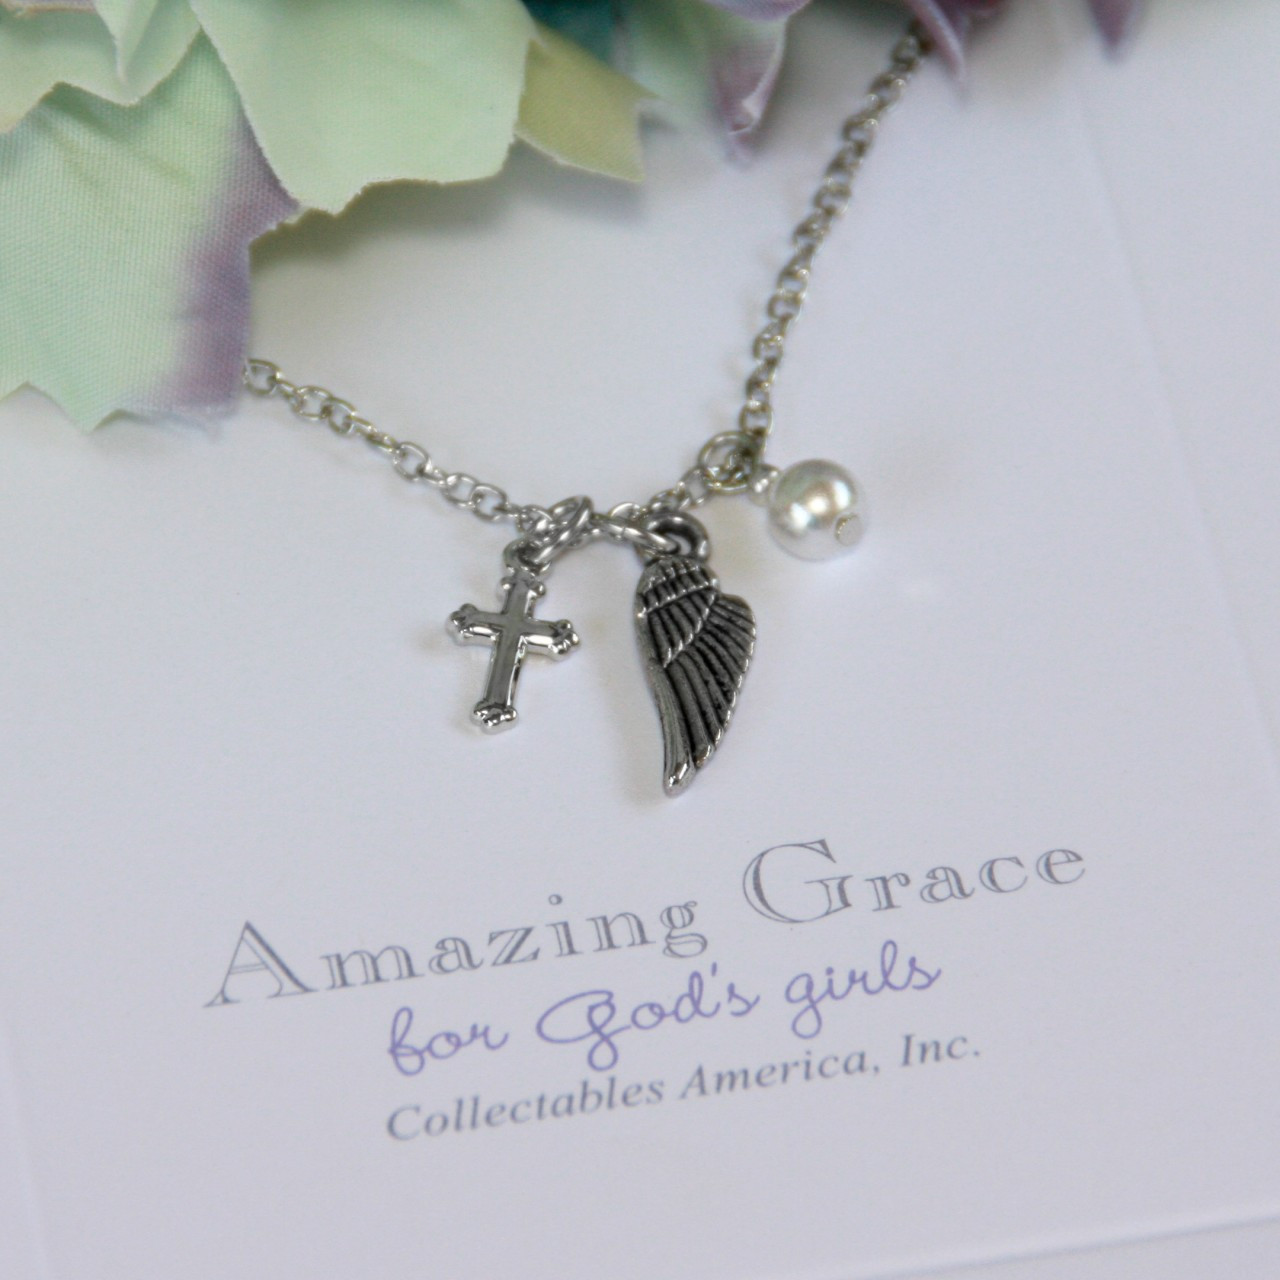 GG-31 Amazing Grace Wings, Cross & Pearl Necklace